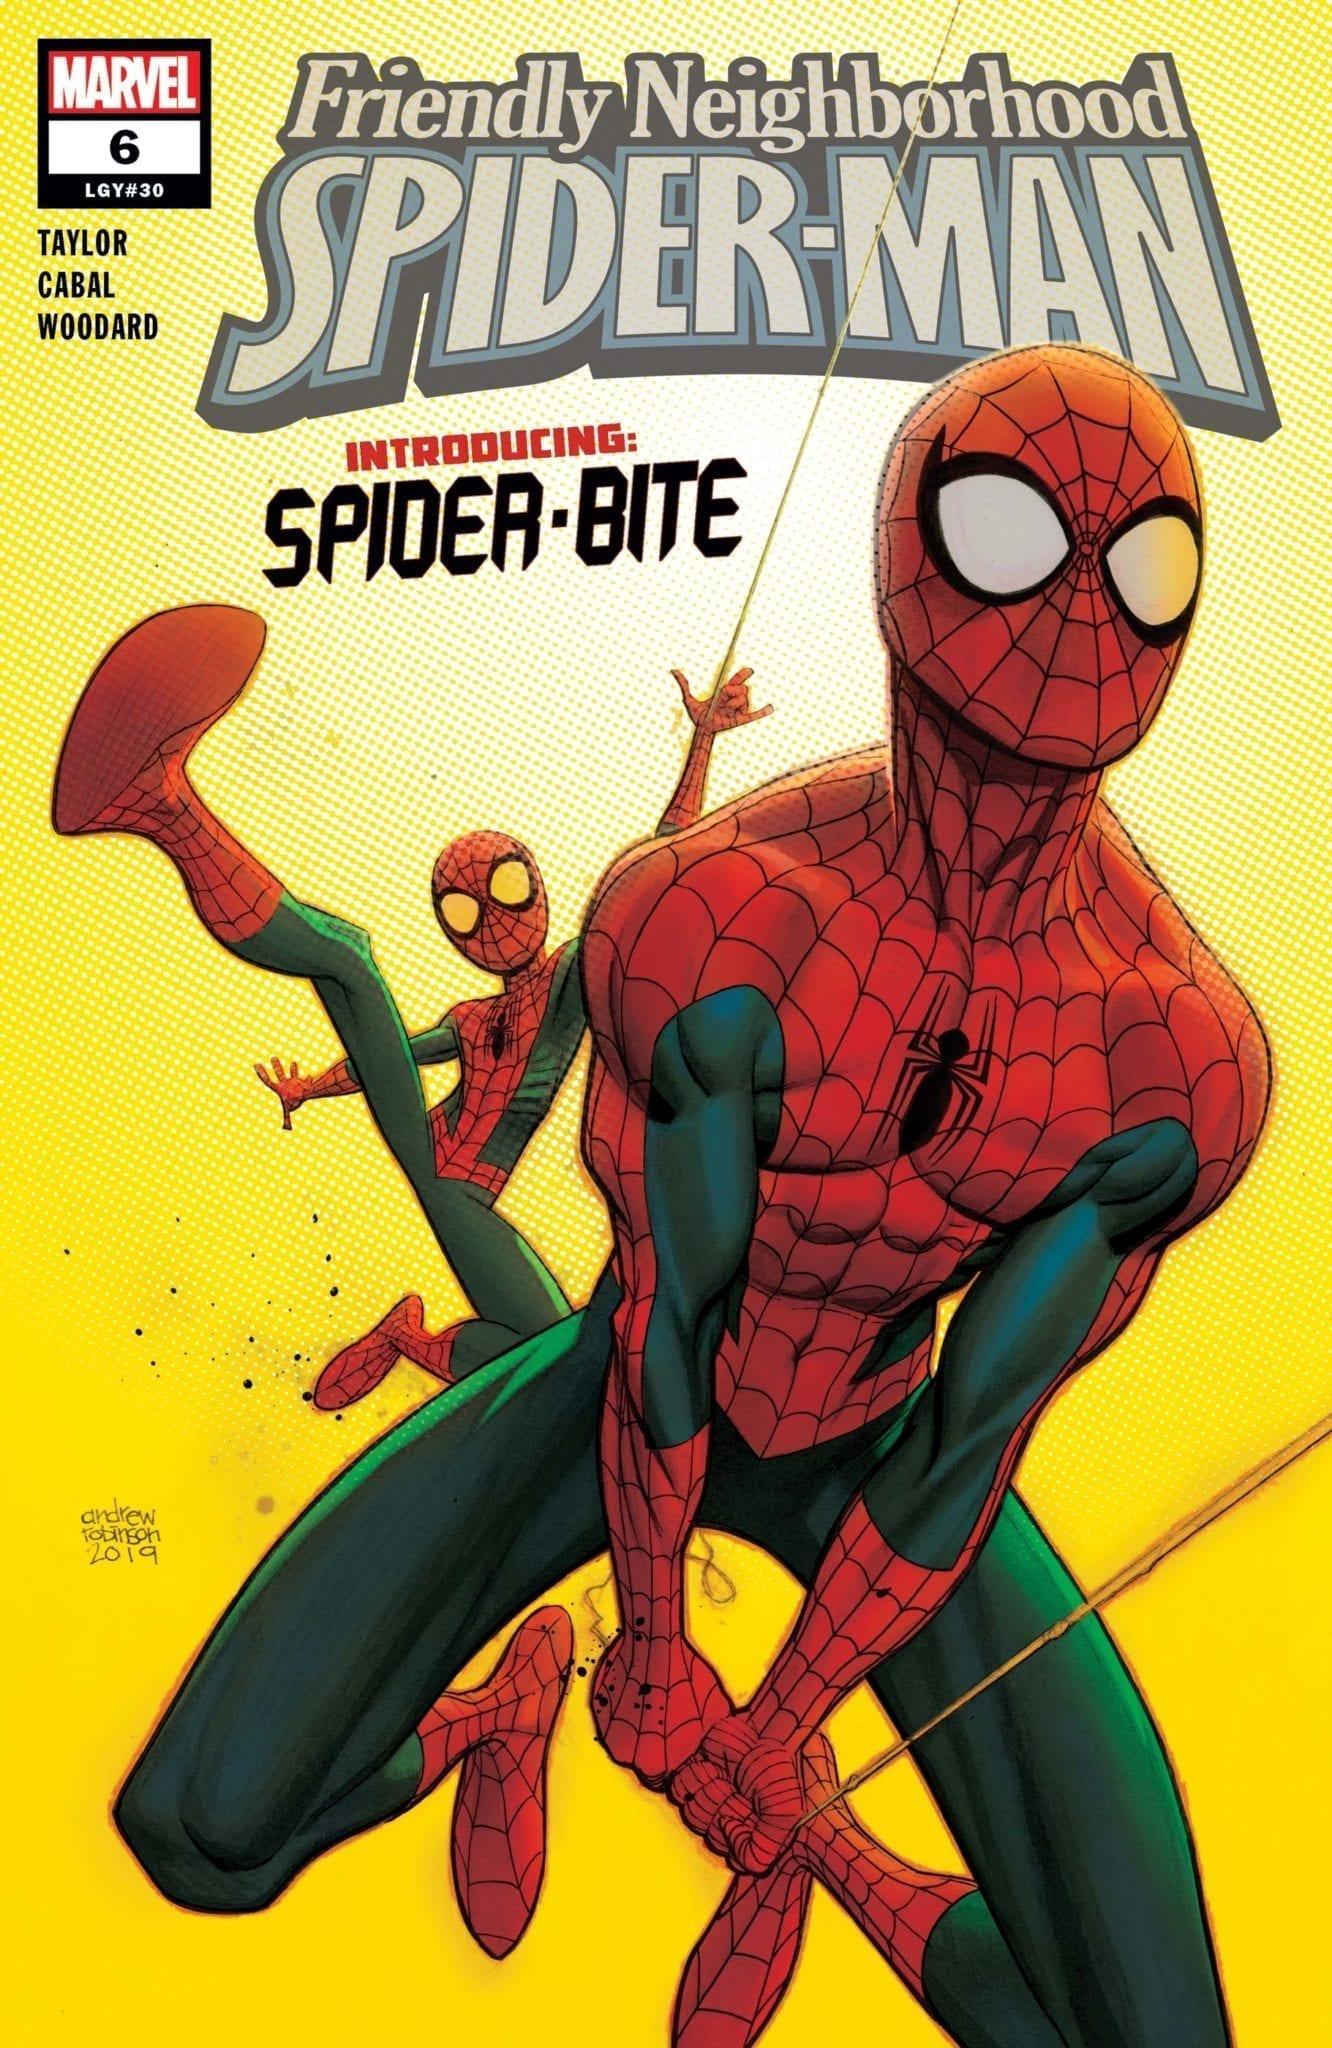 best comic books of 2019 marvel comics friendly neighborhood spider-man